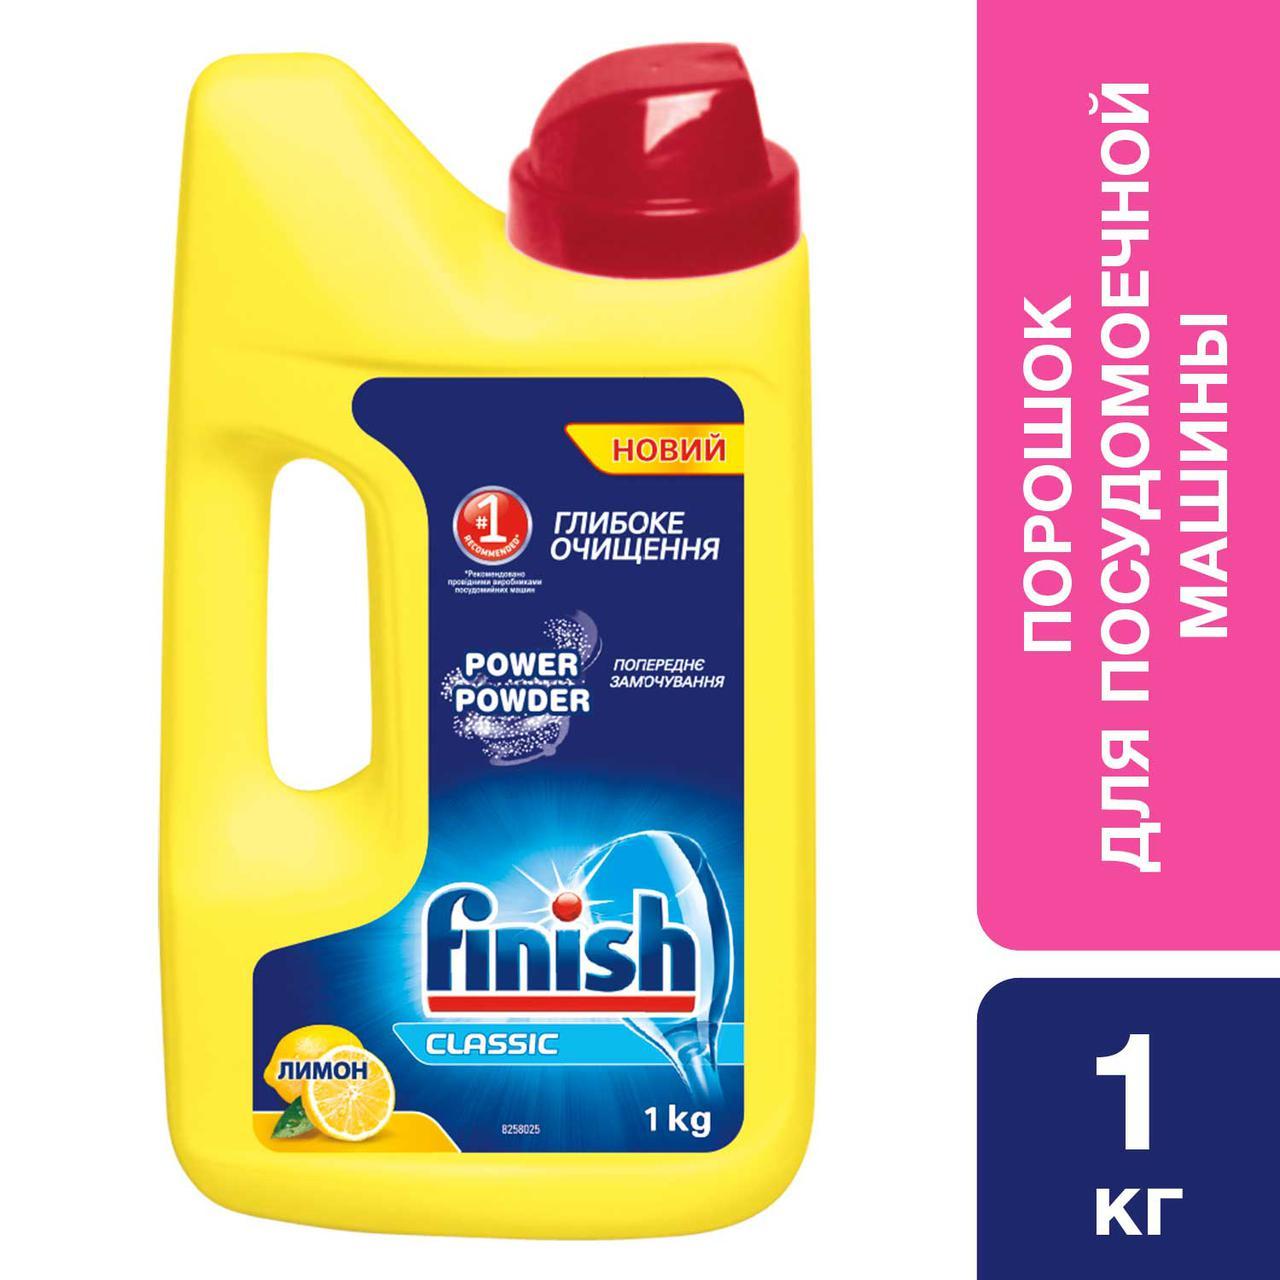 Порошок для миття посуду в посудомийних машинах FINISH 1 кг з ароматом лимона